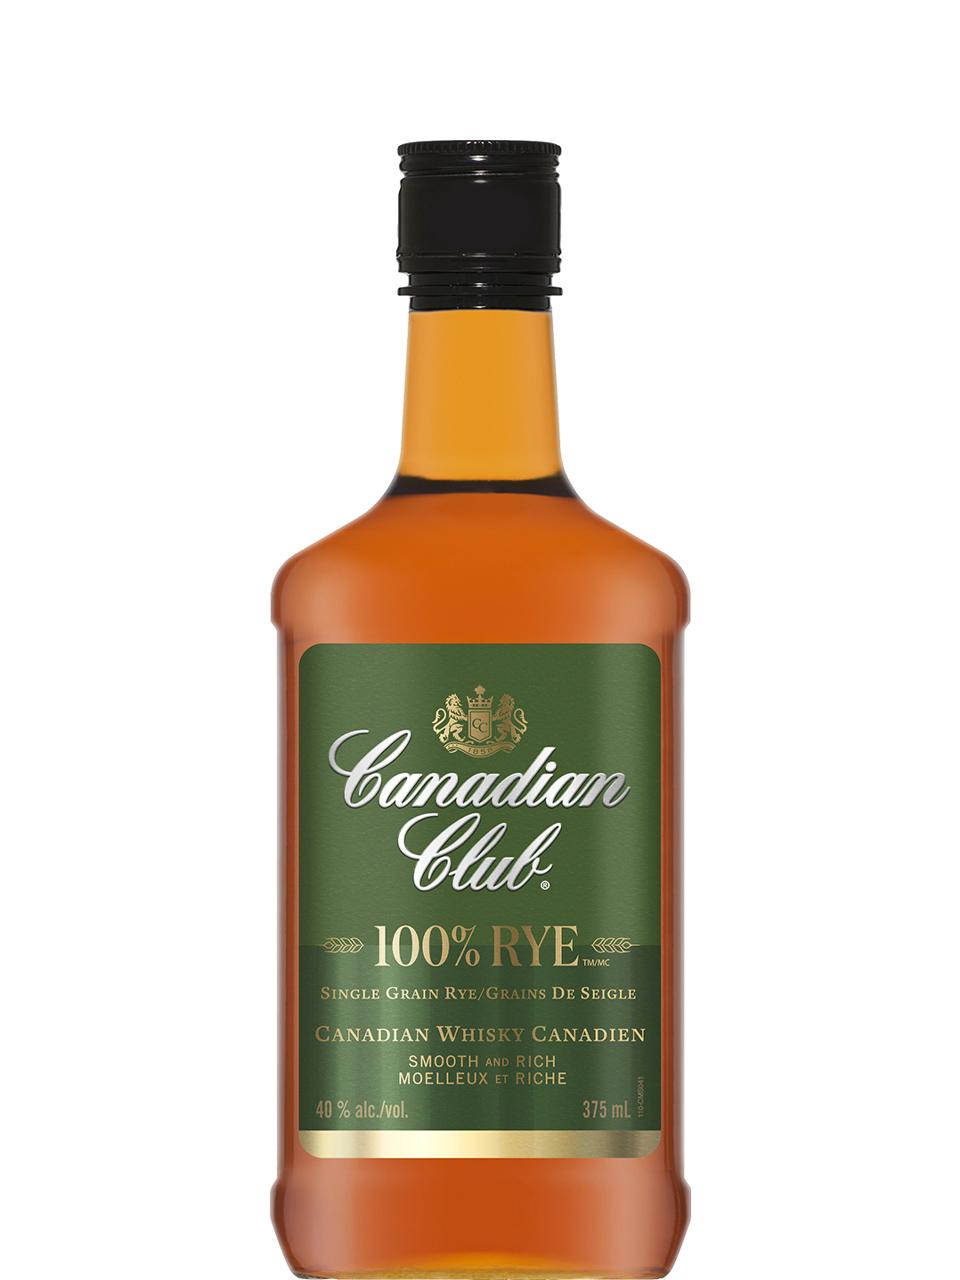 Canadian Club 100% Rye Whisky